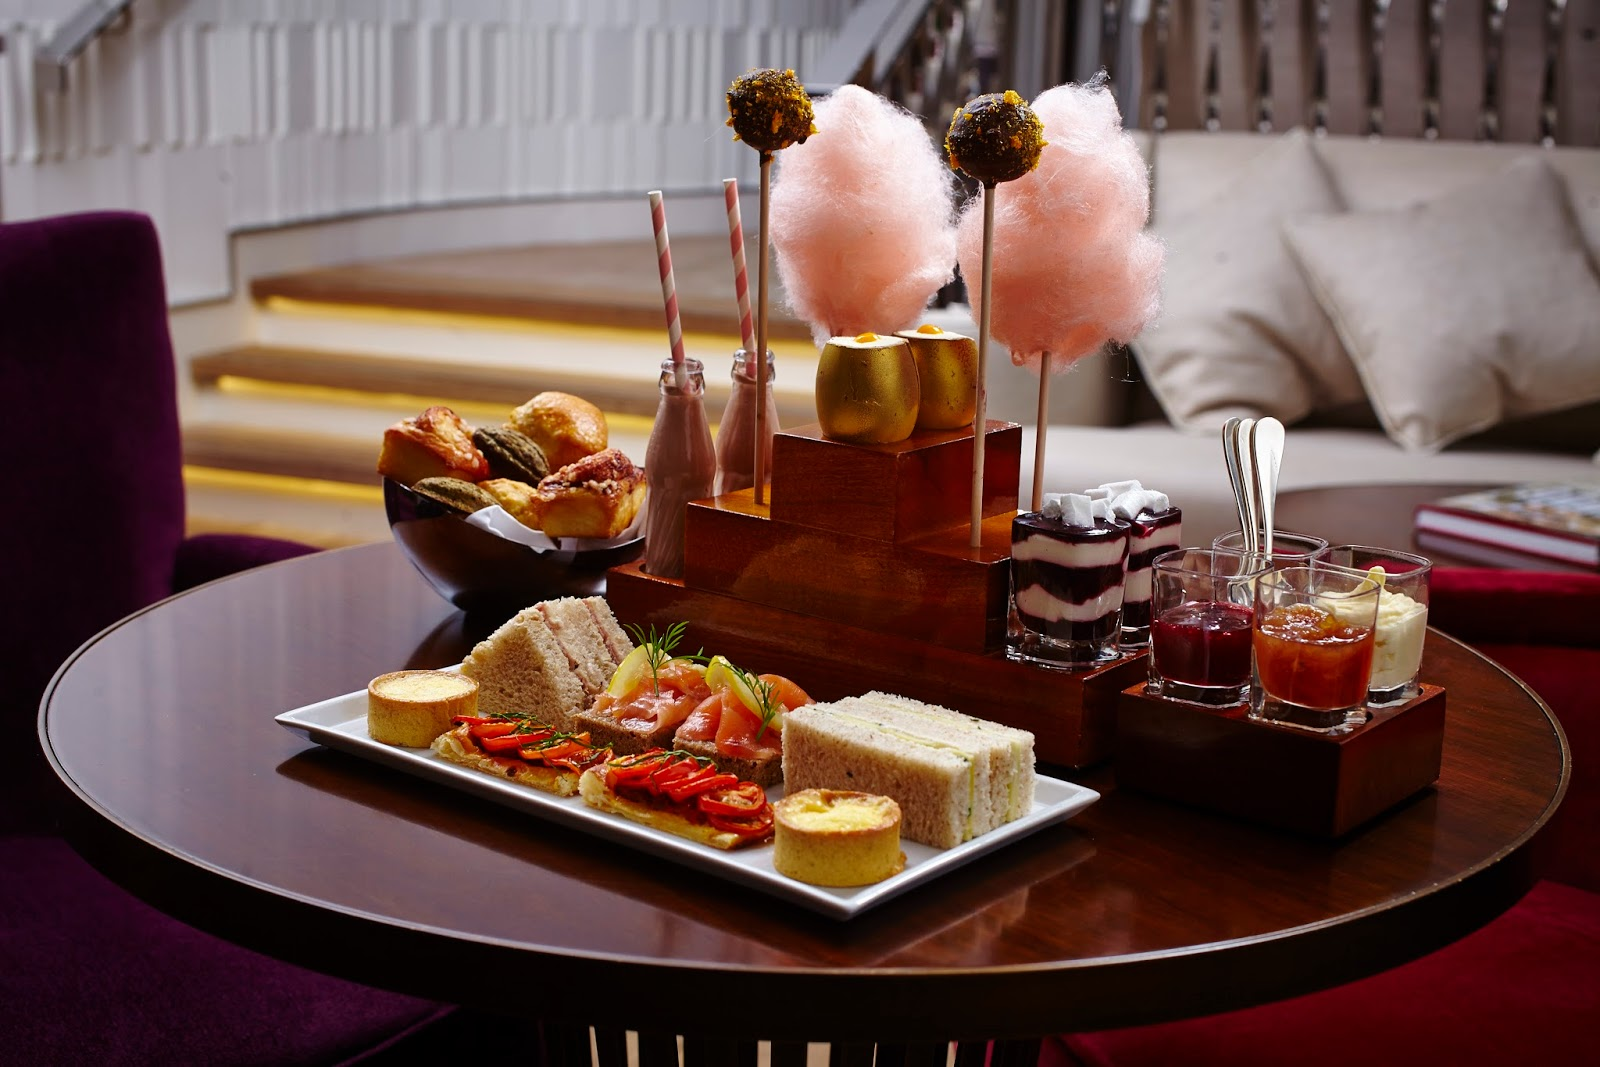 Formidable Joy - UK Fashion, Beauty & Lifestyle Blog   Food   5 Ways to celebrate Afternoon Tea Week; Formidable Joy; Formidable Joy Blog; Afternoon Tea; Afternoon Tea Week